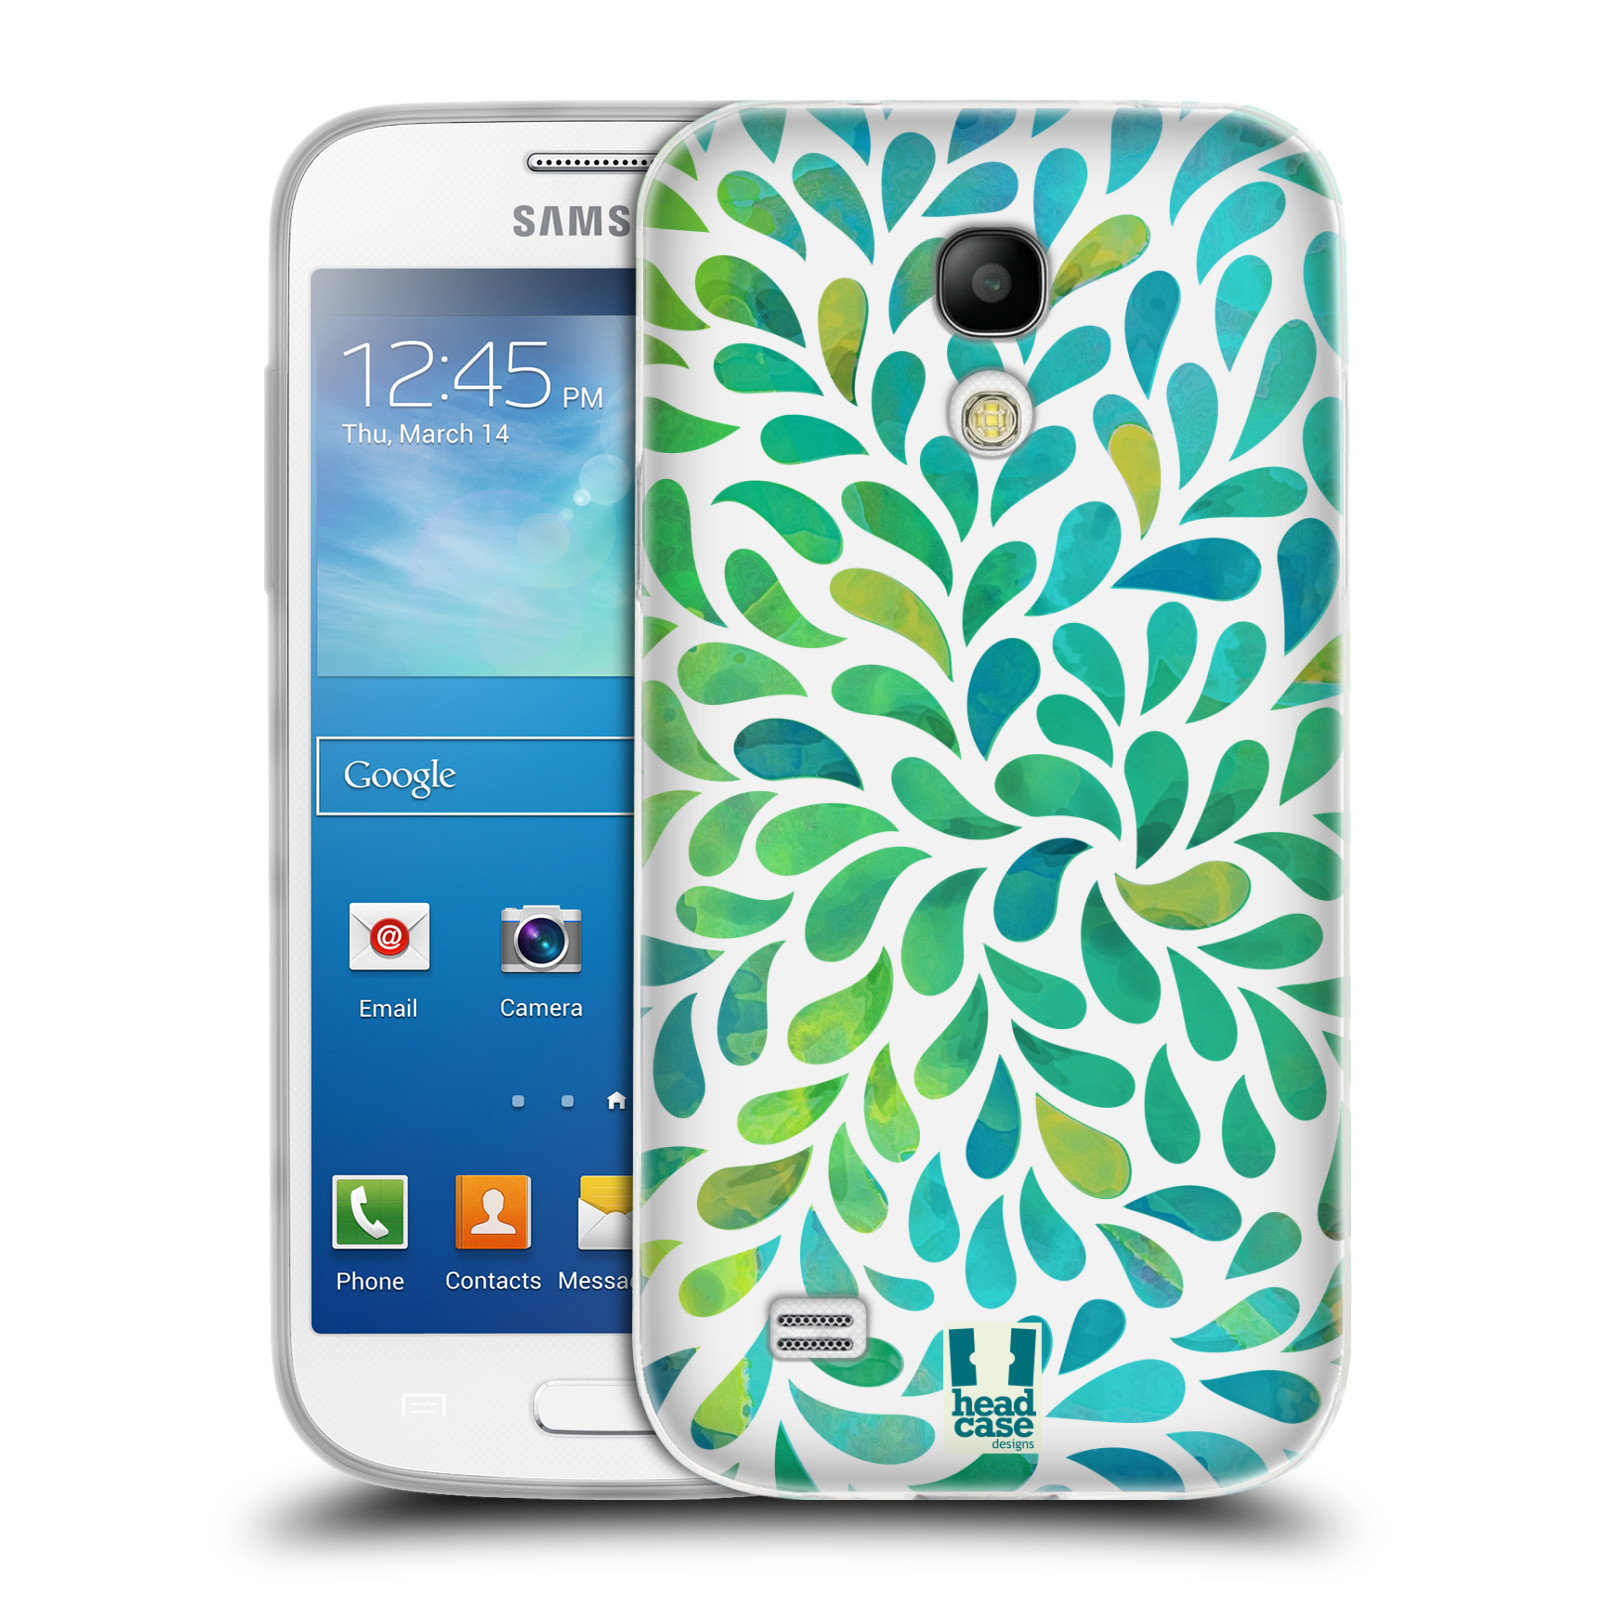 Silikonové pouzdro na mobil Samsung Galaxy S4 Mini HEAD CASE Droplet Wave Kapičky (Silikonový kryt či obal na mobilní telefon Samsung Galaxy S4 Mini GT-i9195 / i9190)